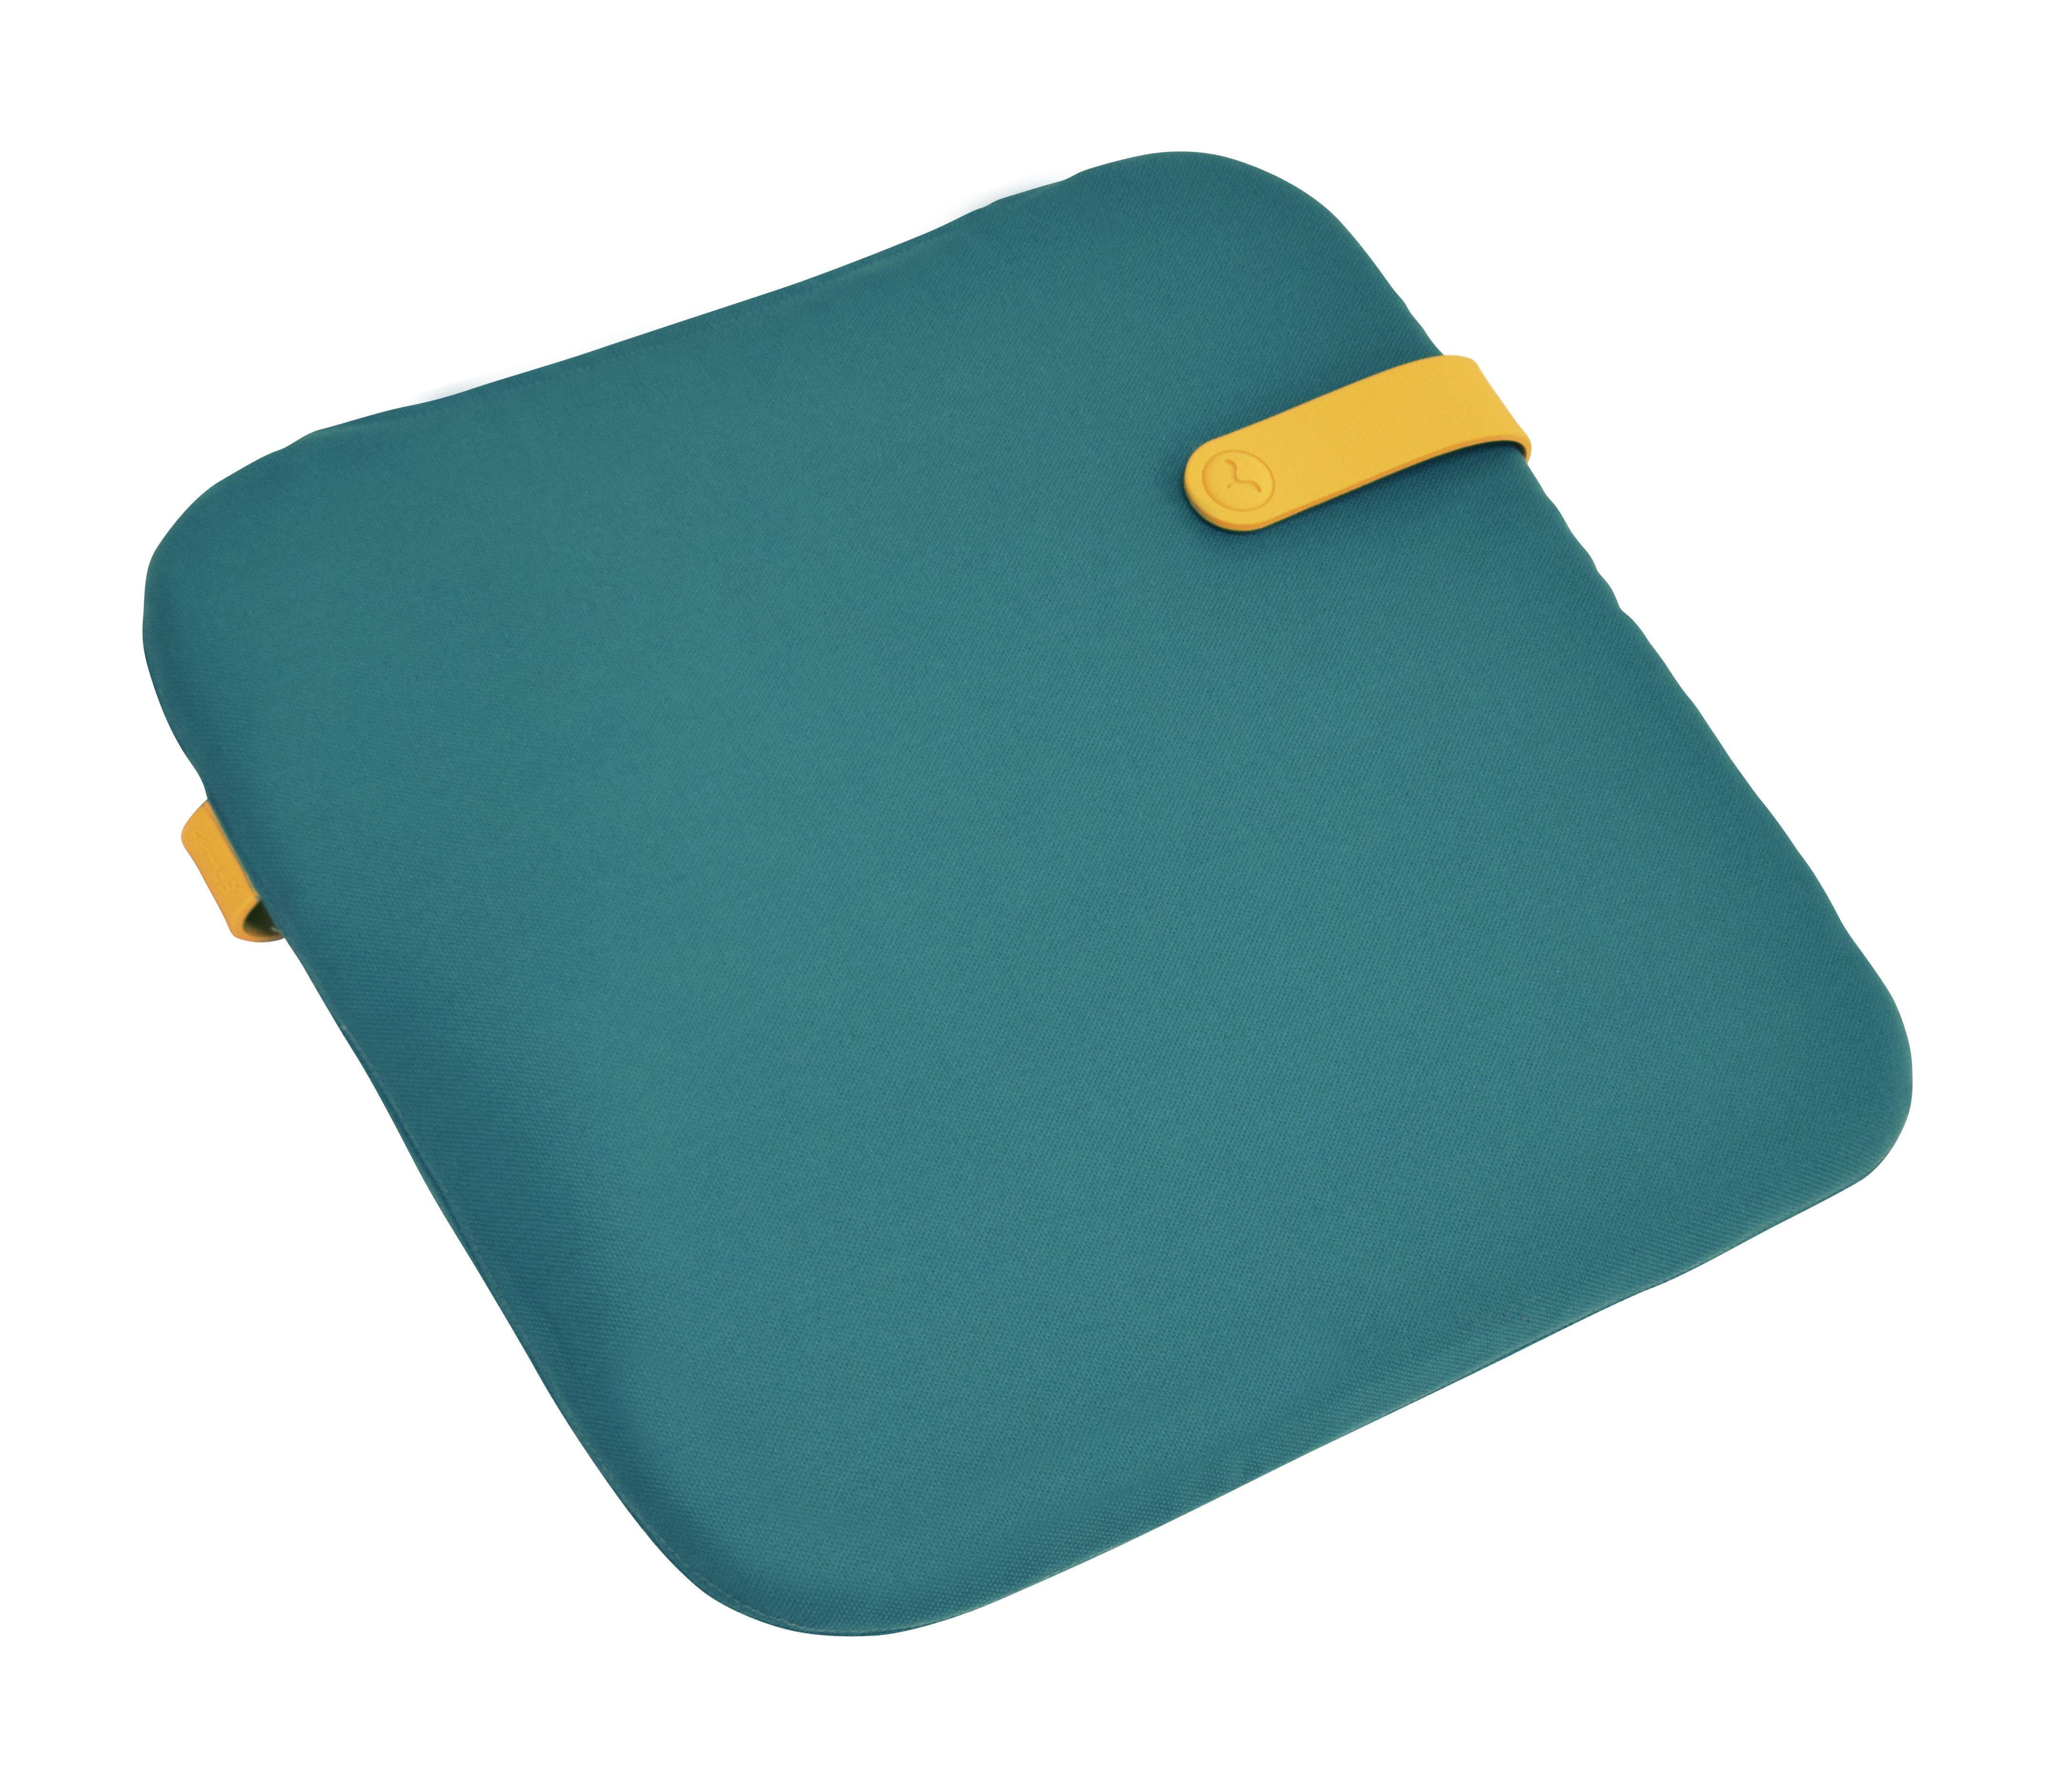 Dekoration - Kissen - Color Mix Sitzkissen / 41 x 38 cm - Fermob - Goa-Blau / Gurt: Honig - Polyacryl-Gewebe, PVC, Schaumstoff